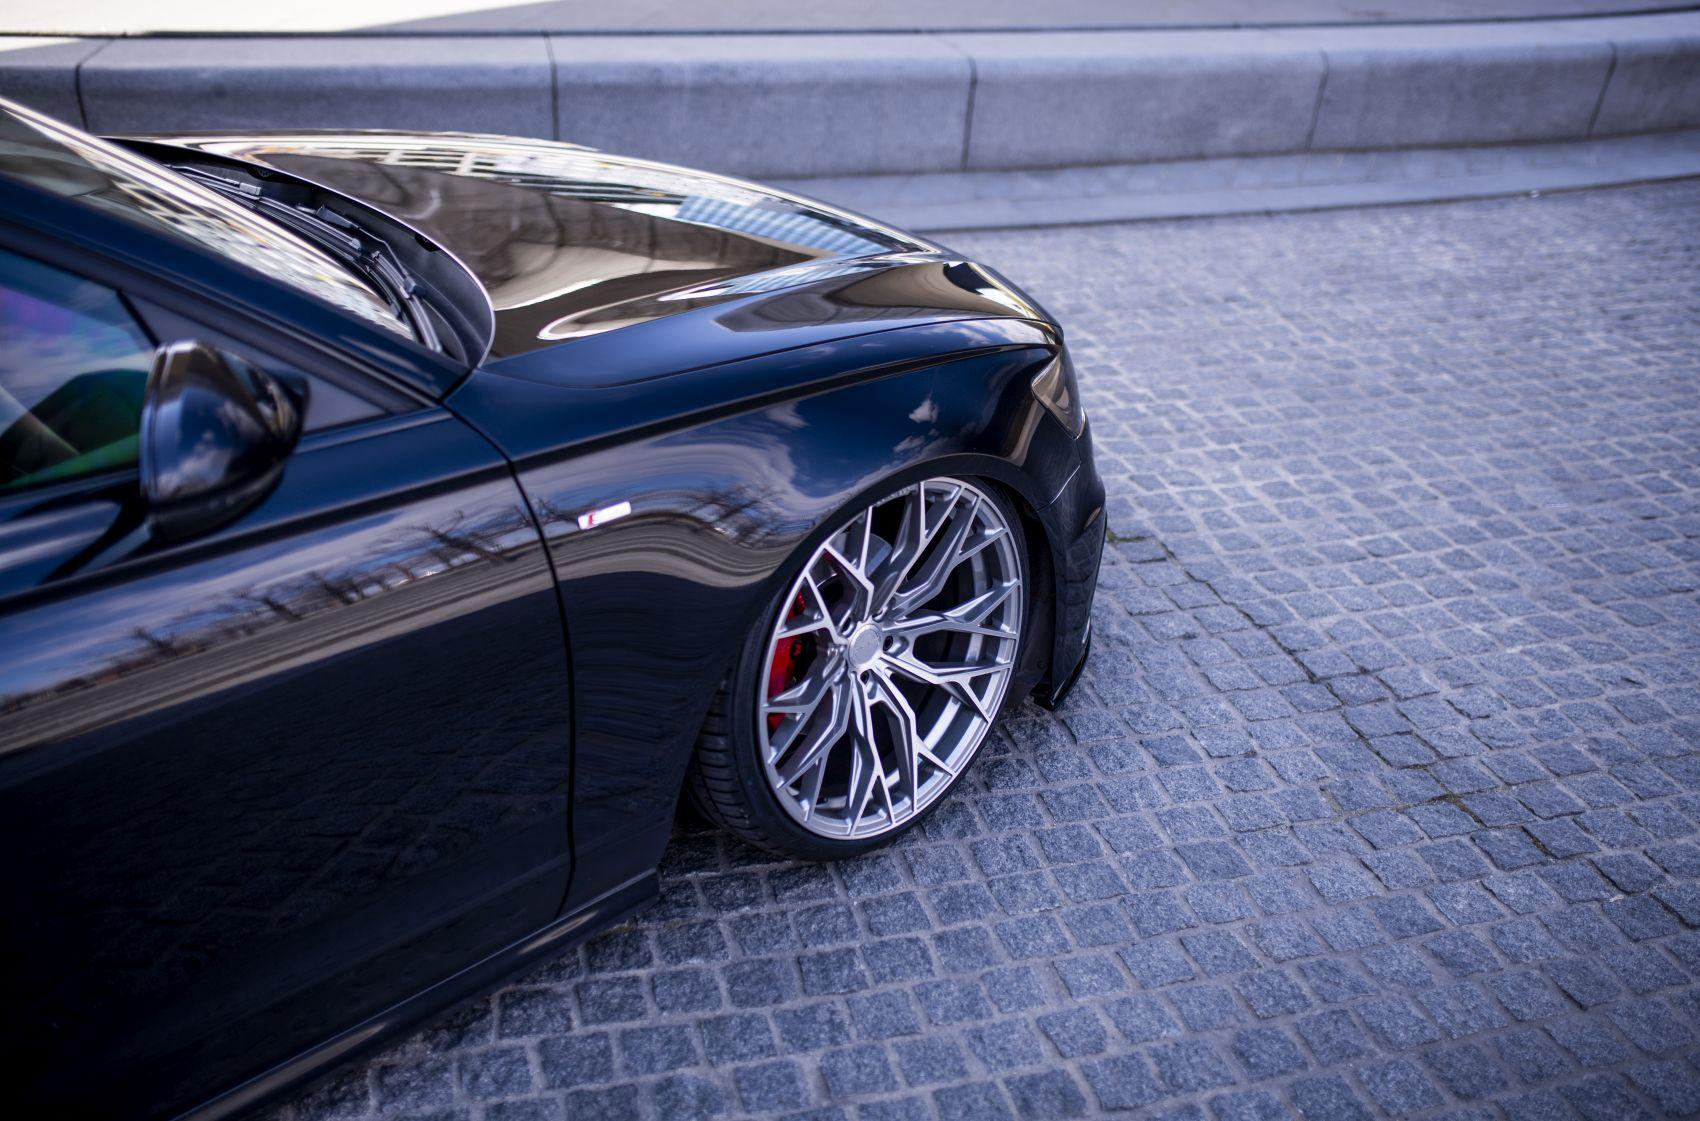 Audi A6 / S6 / RS6 Concaver CVR1 Brushed Titanium